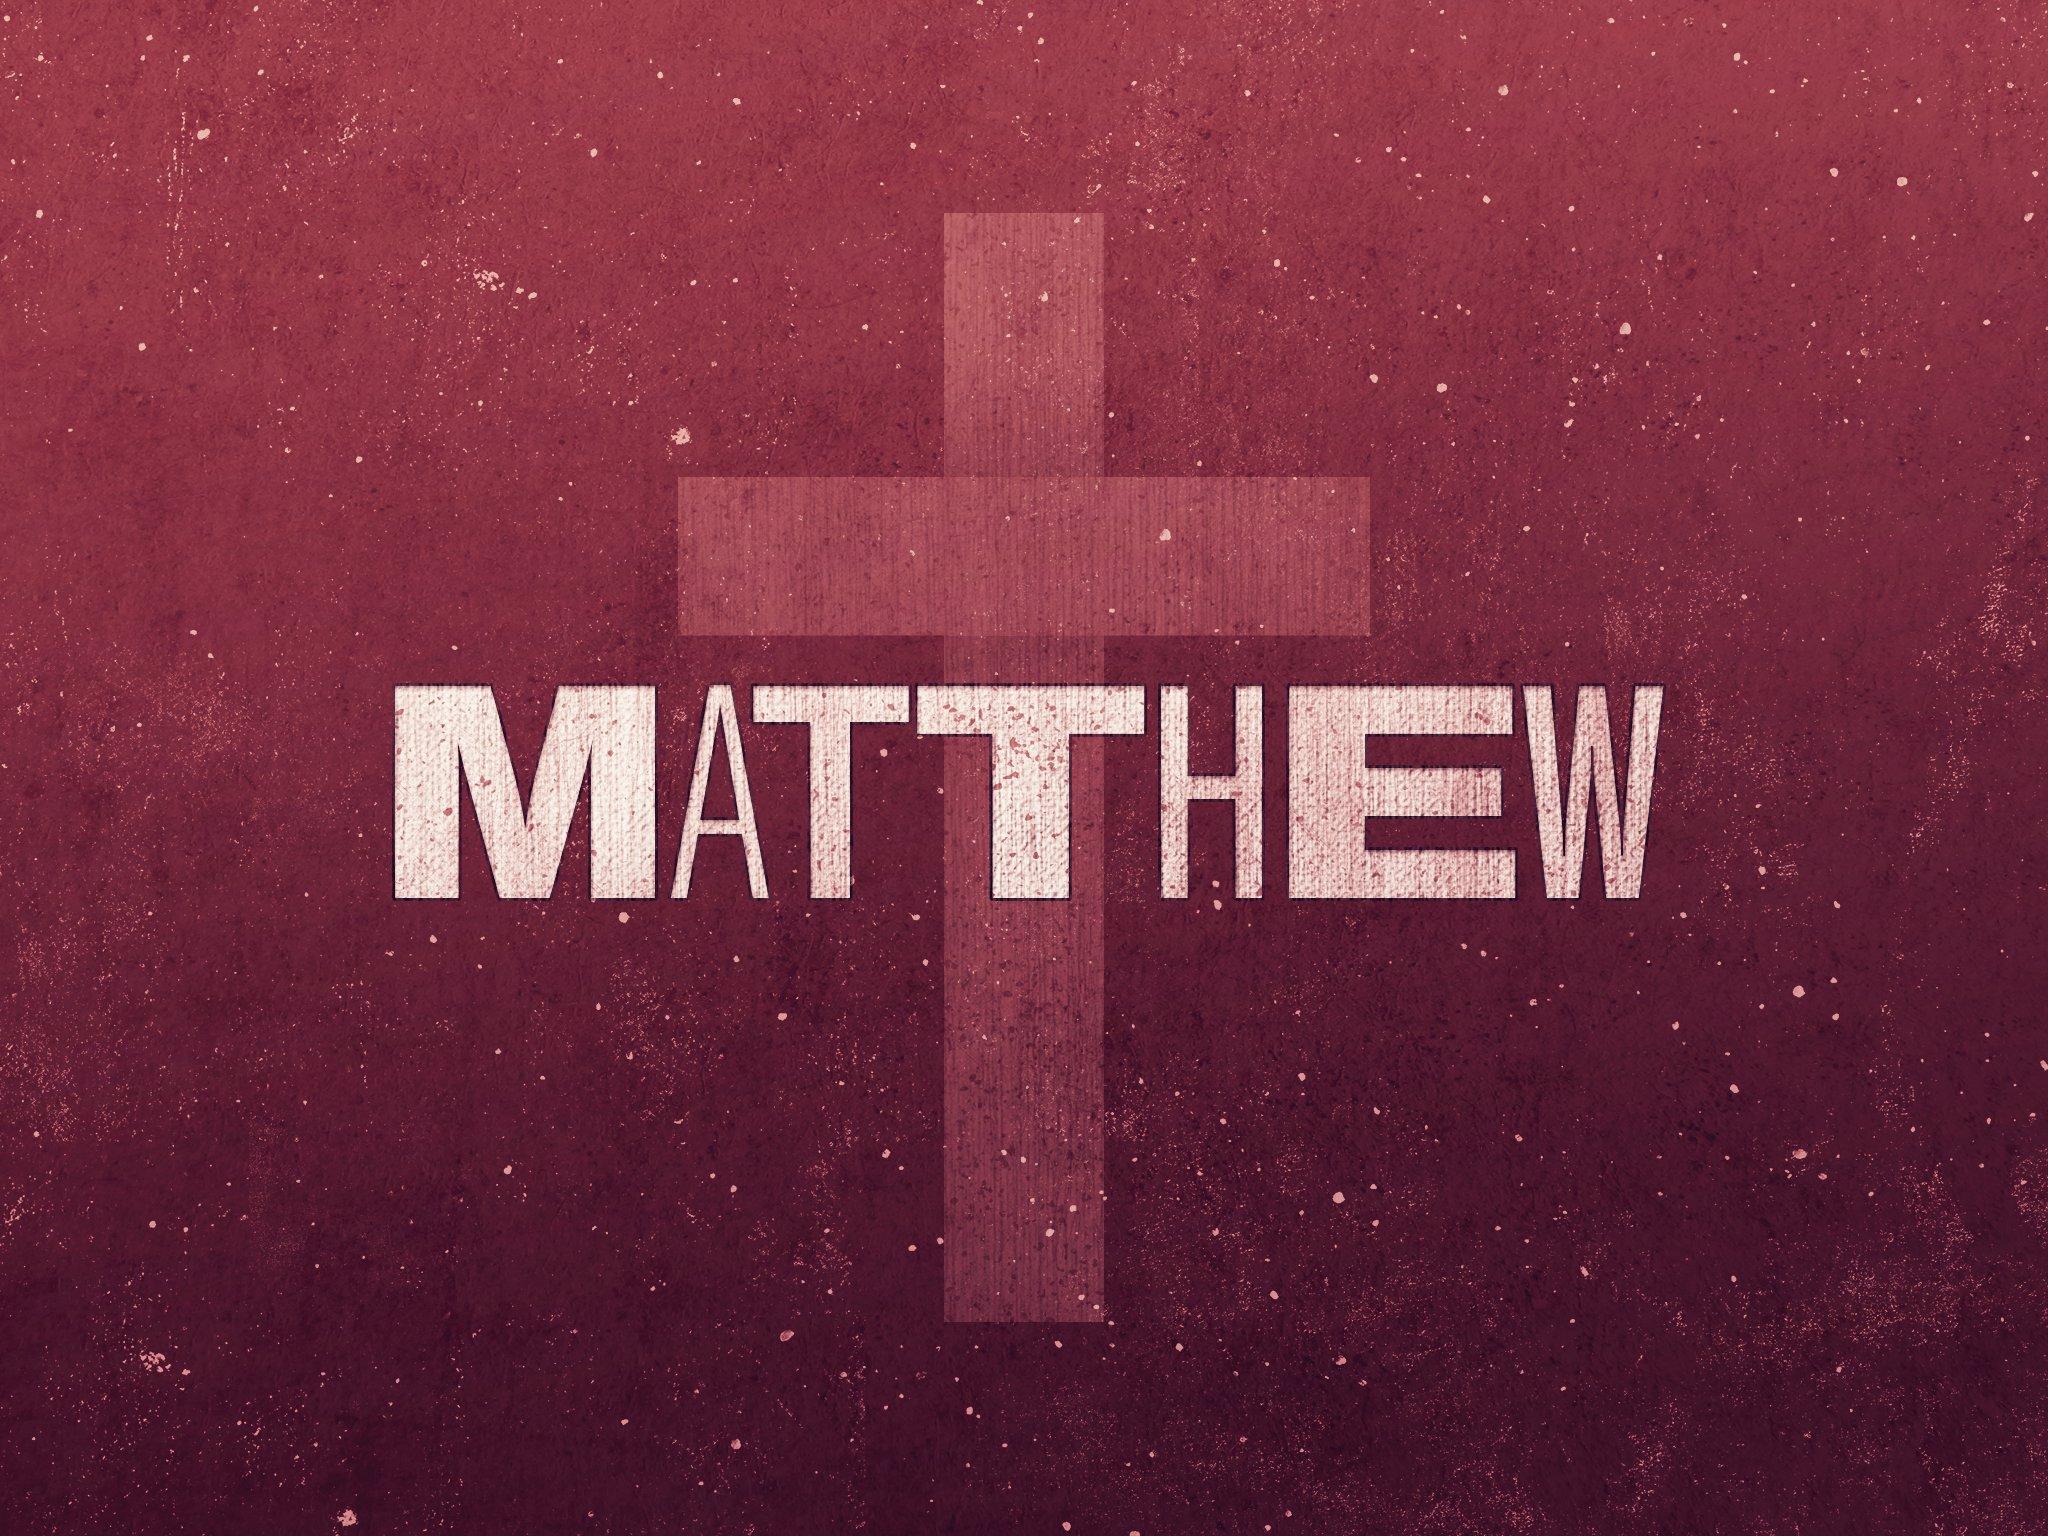 40-Matthew_Title_4x3-fullscreen.jpg